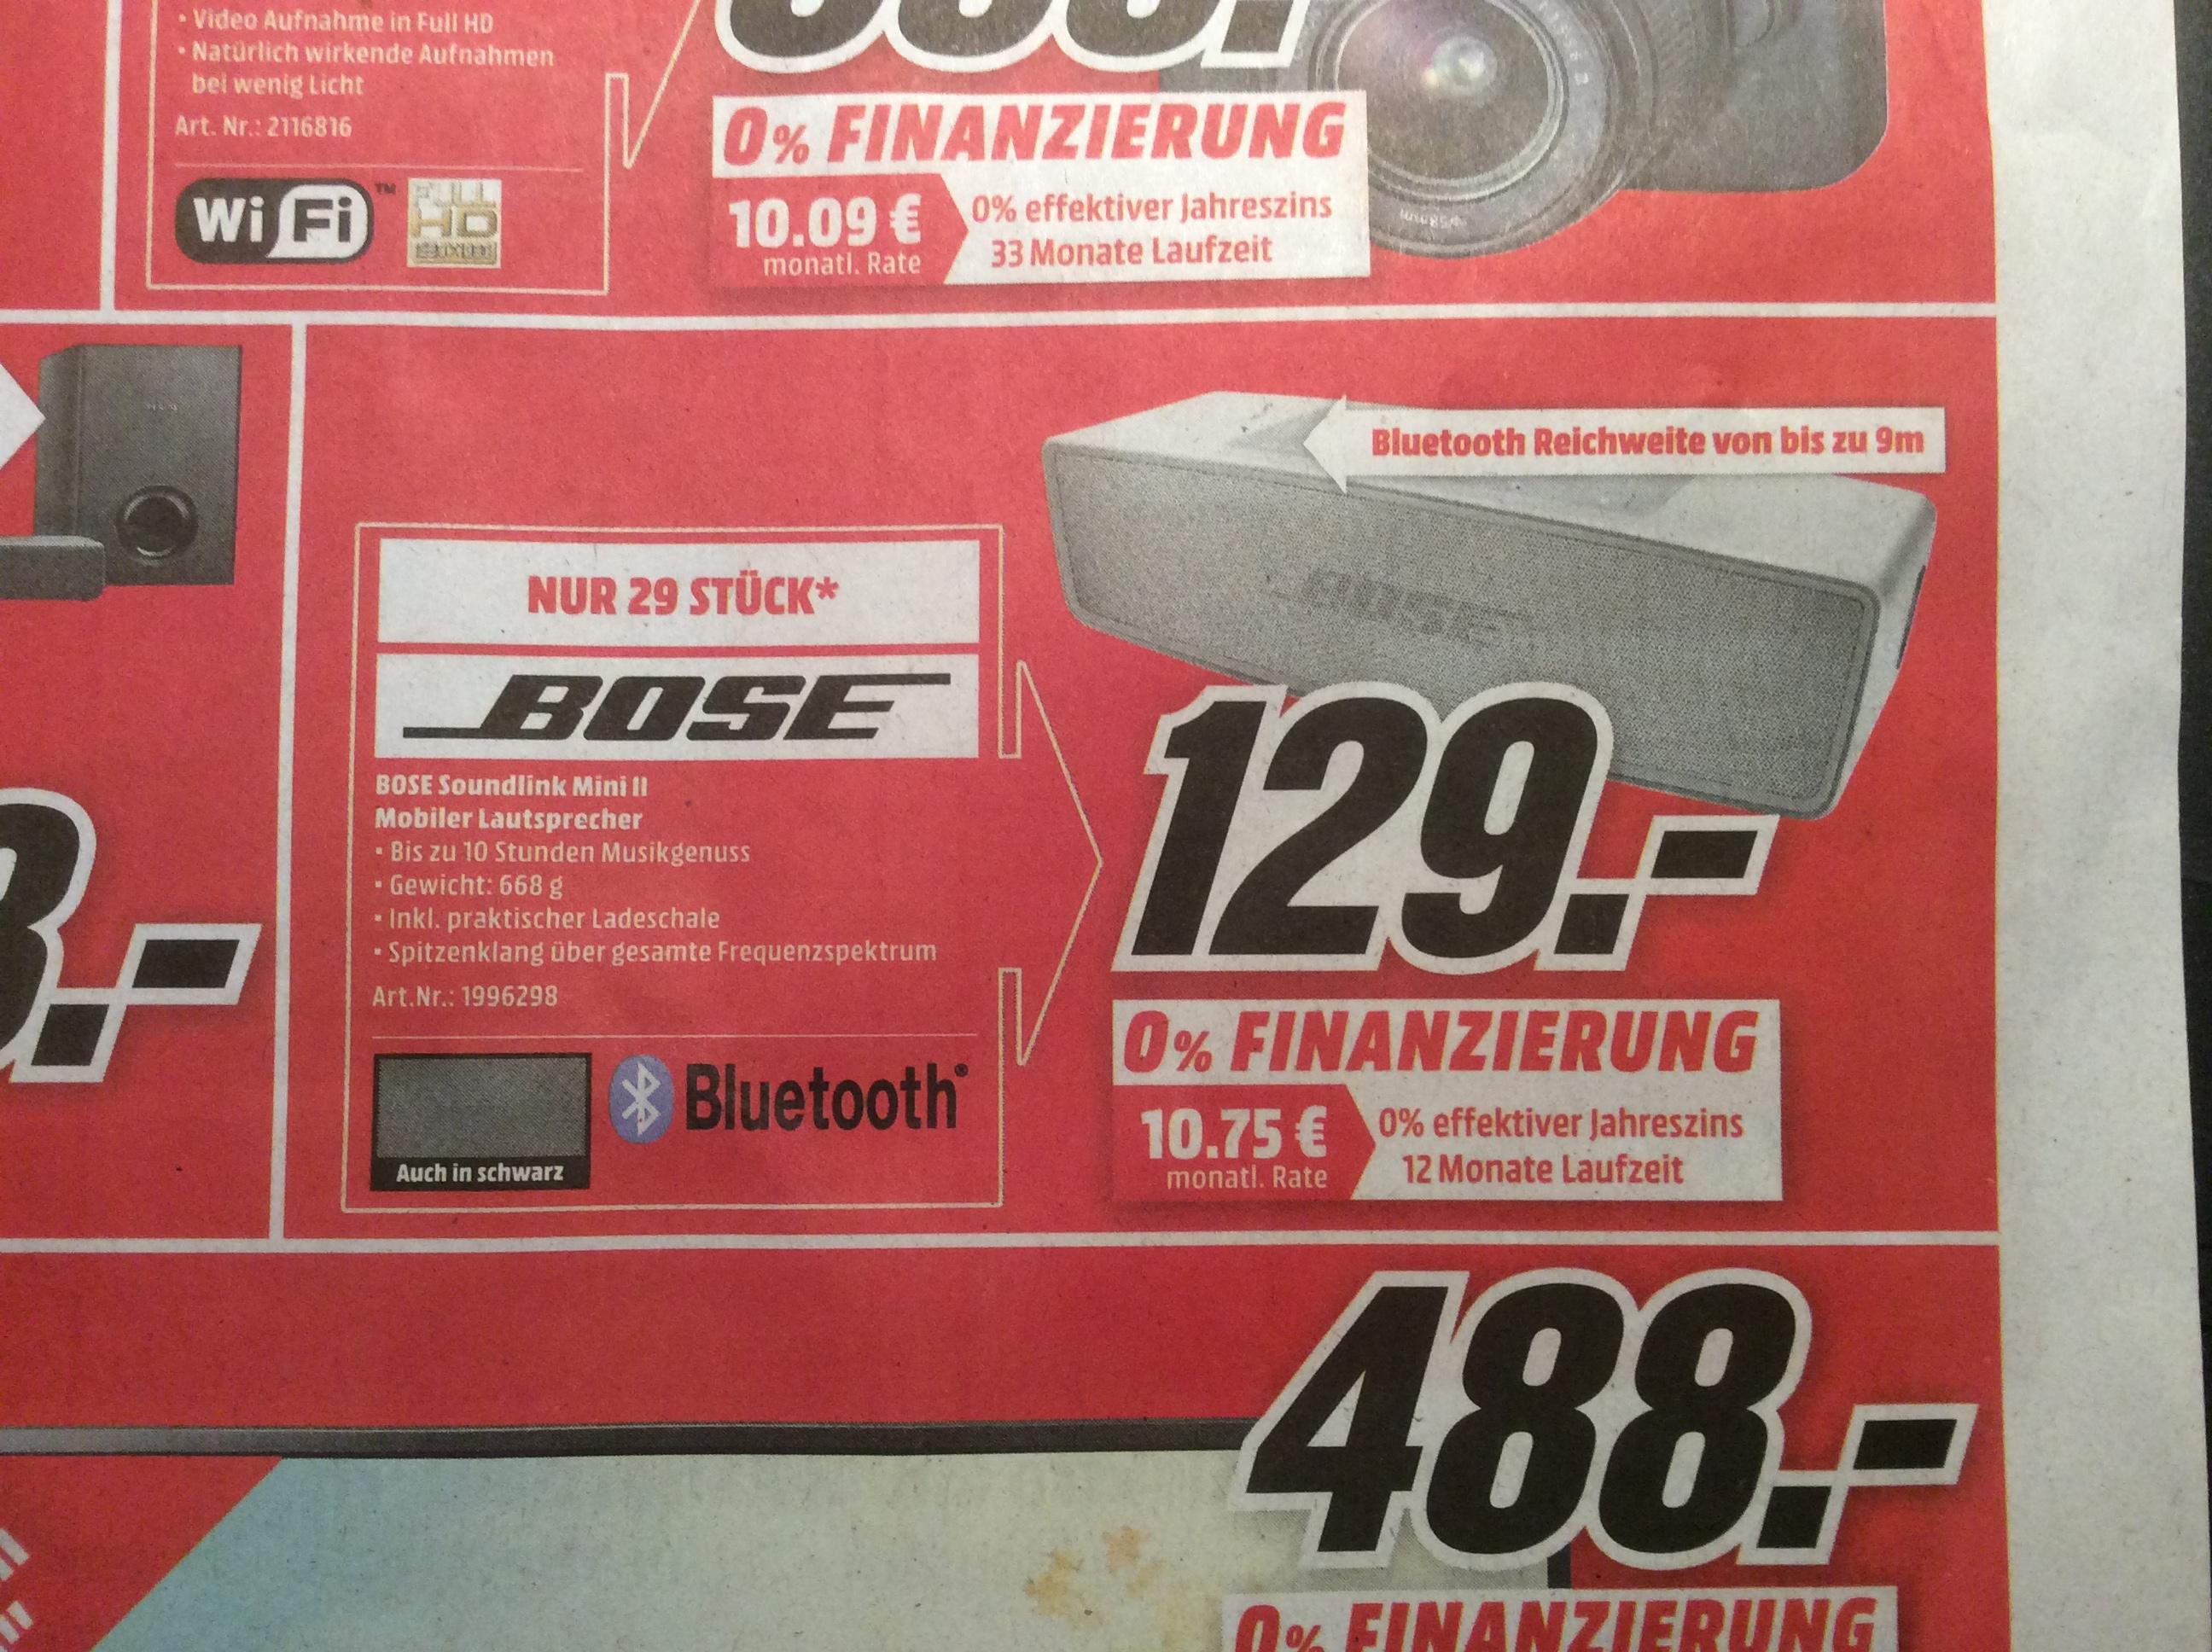 [lokal MM Kaiserslautern] - Bose Soundlink Mini II für 129€